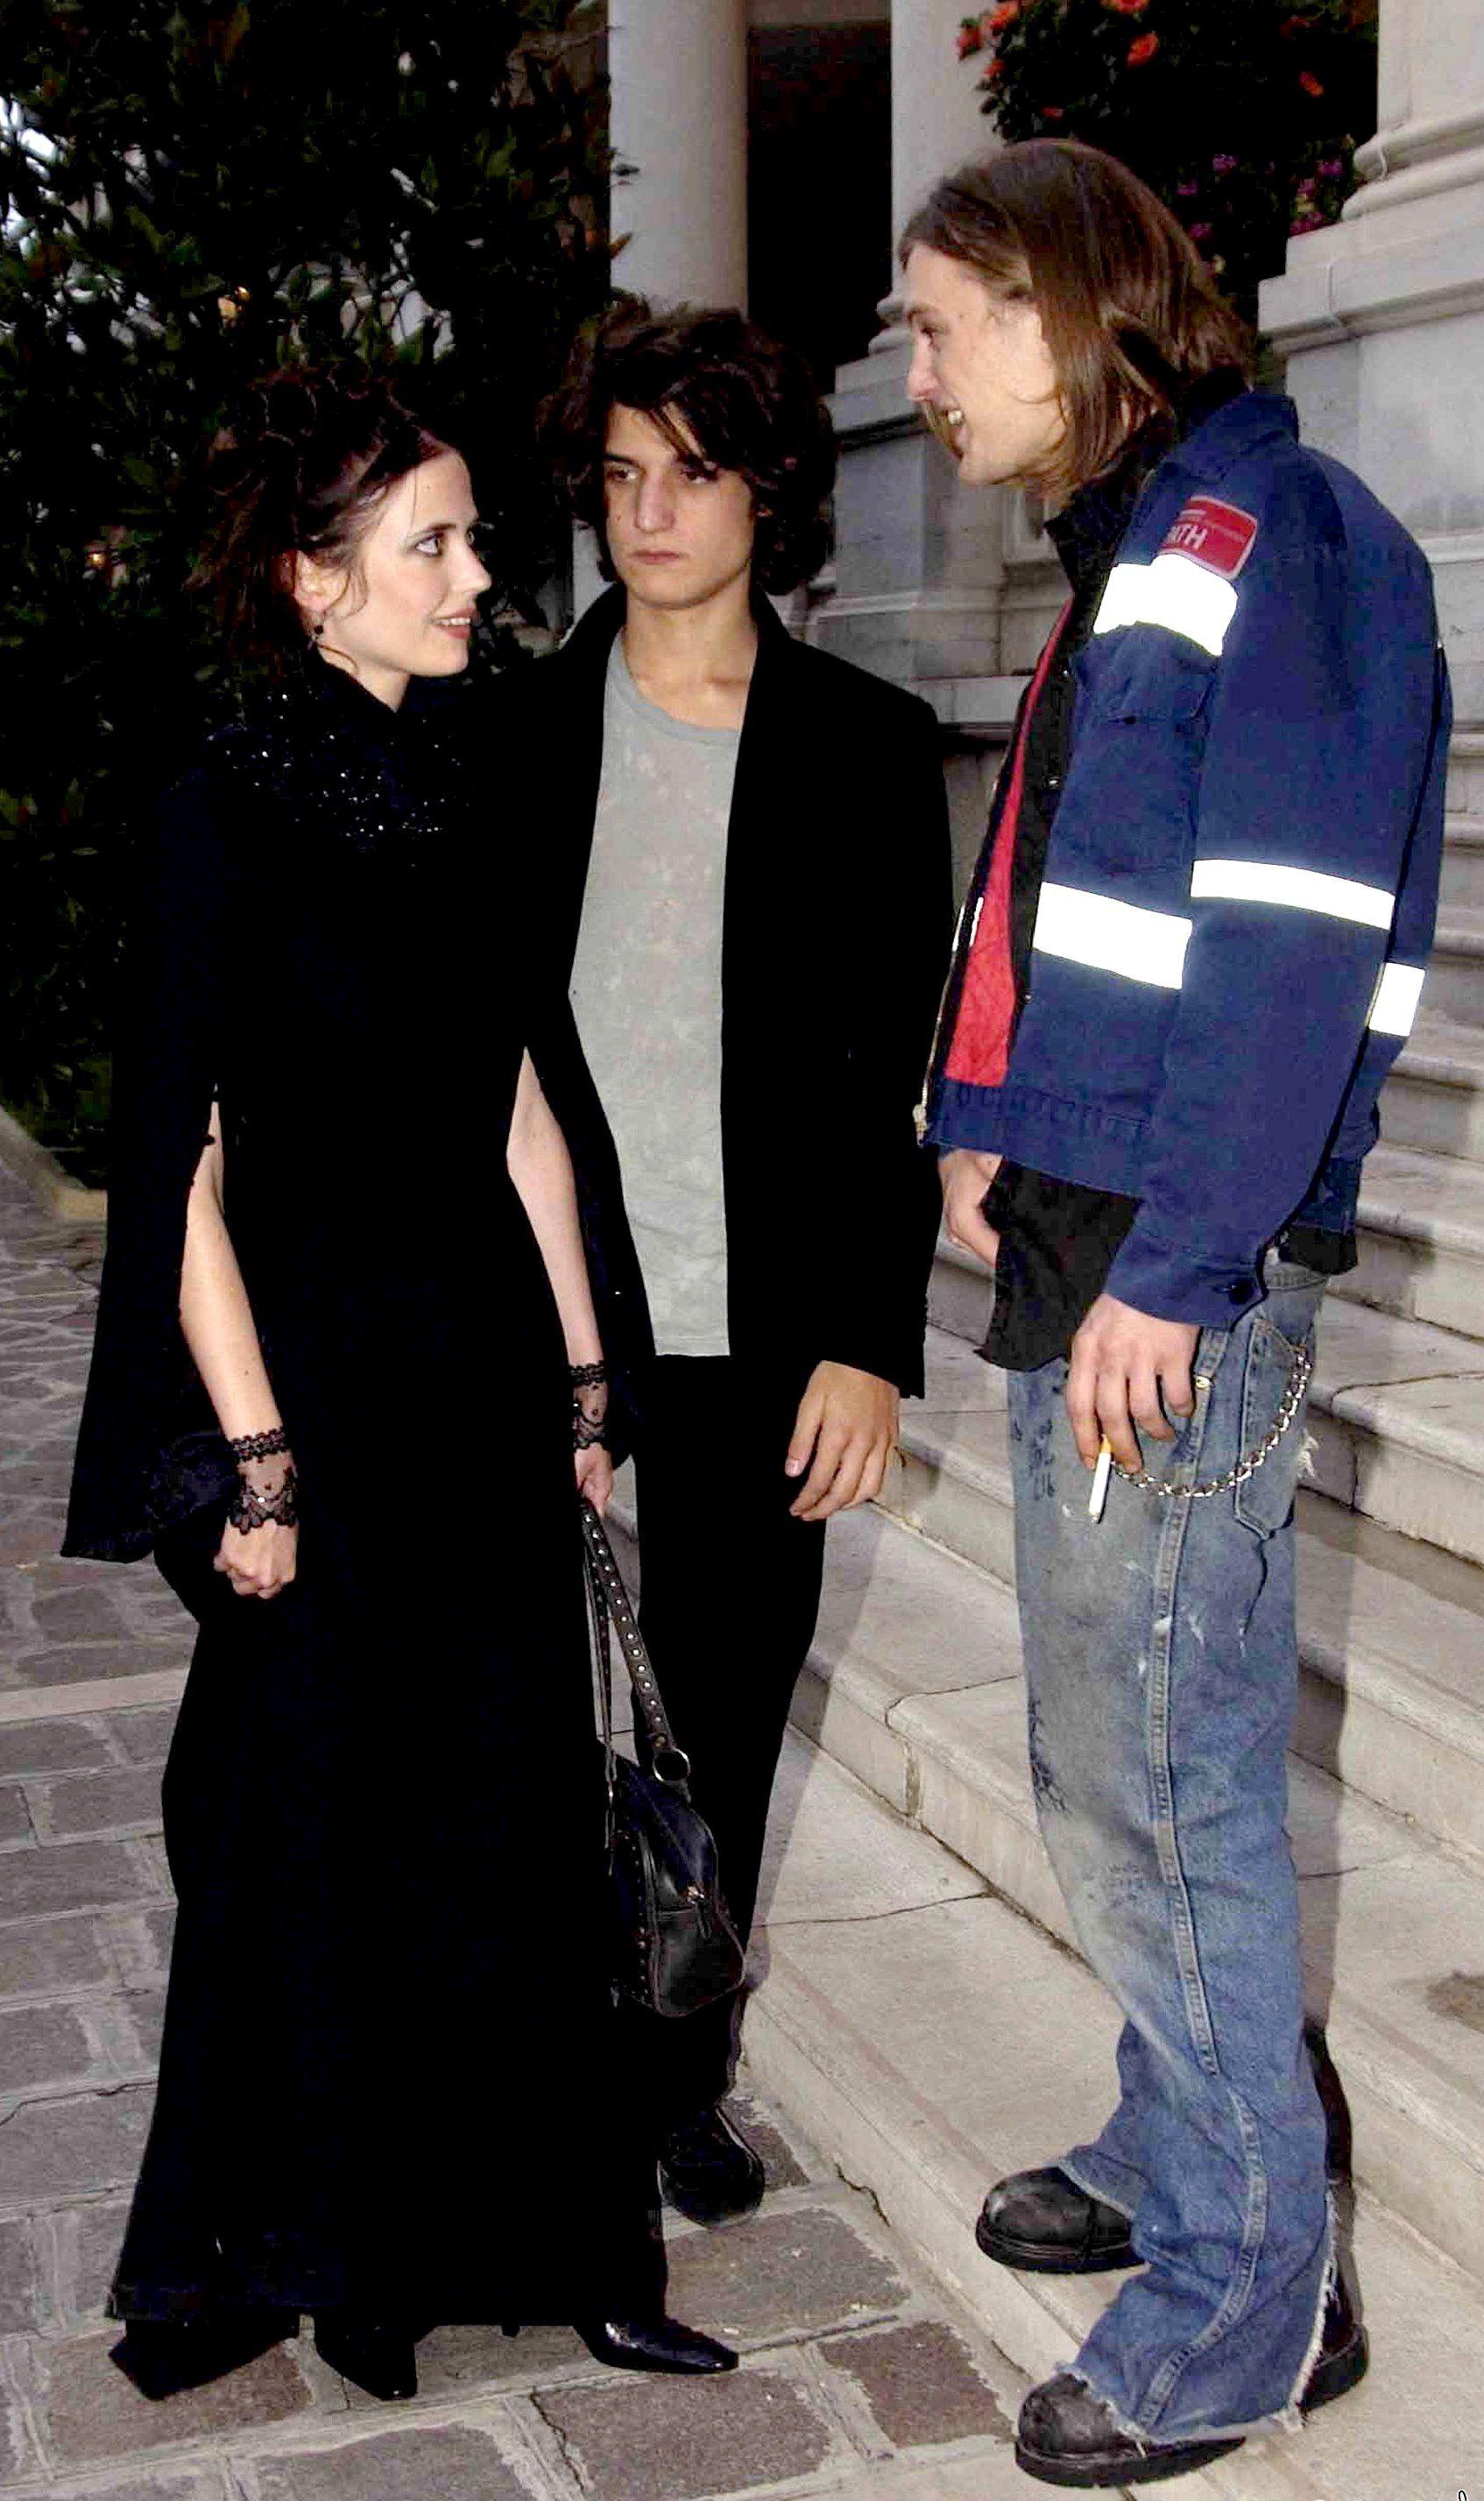 Eva Green with Louis Garrel and Michael Pitt | 'The Dreamers' Screening at  Venice Film Festival -Sept. 2003